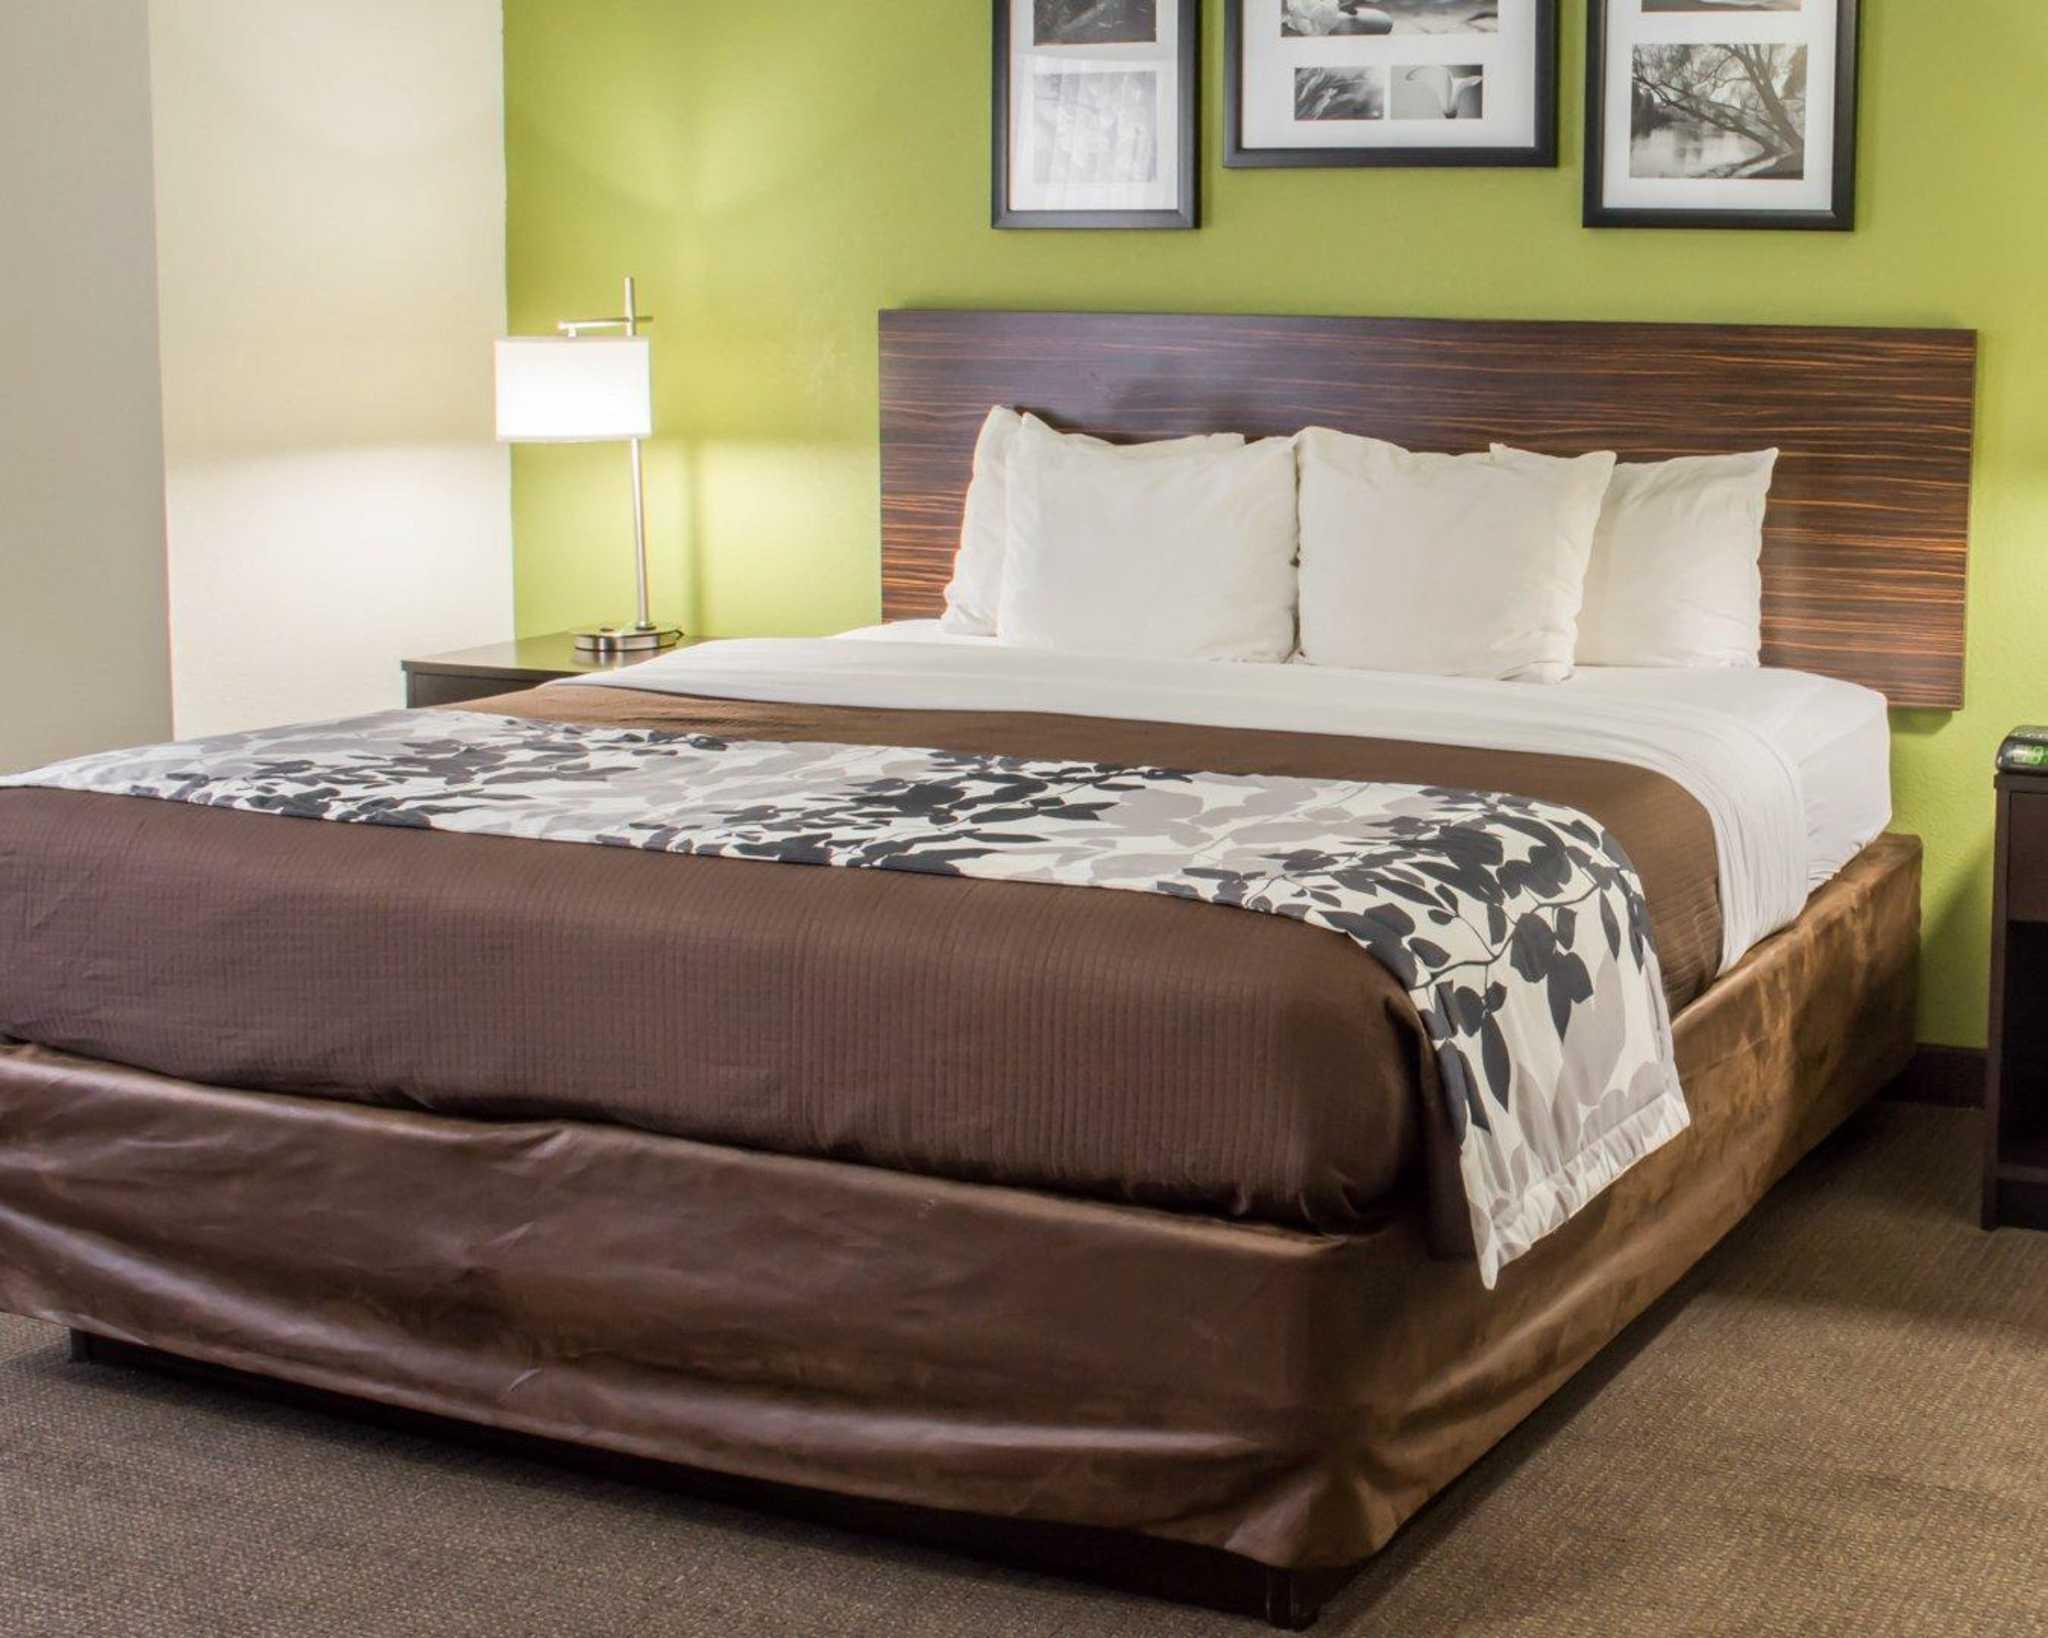 Sleep Inn & Suites near Halifax Regional Medical Center image 10